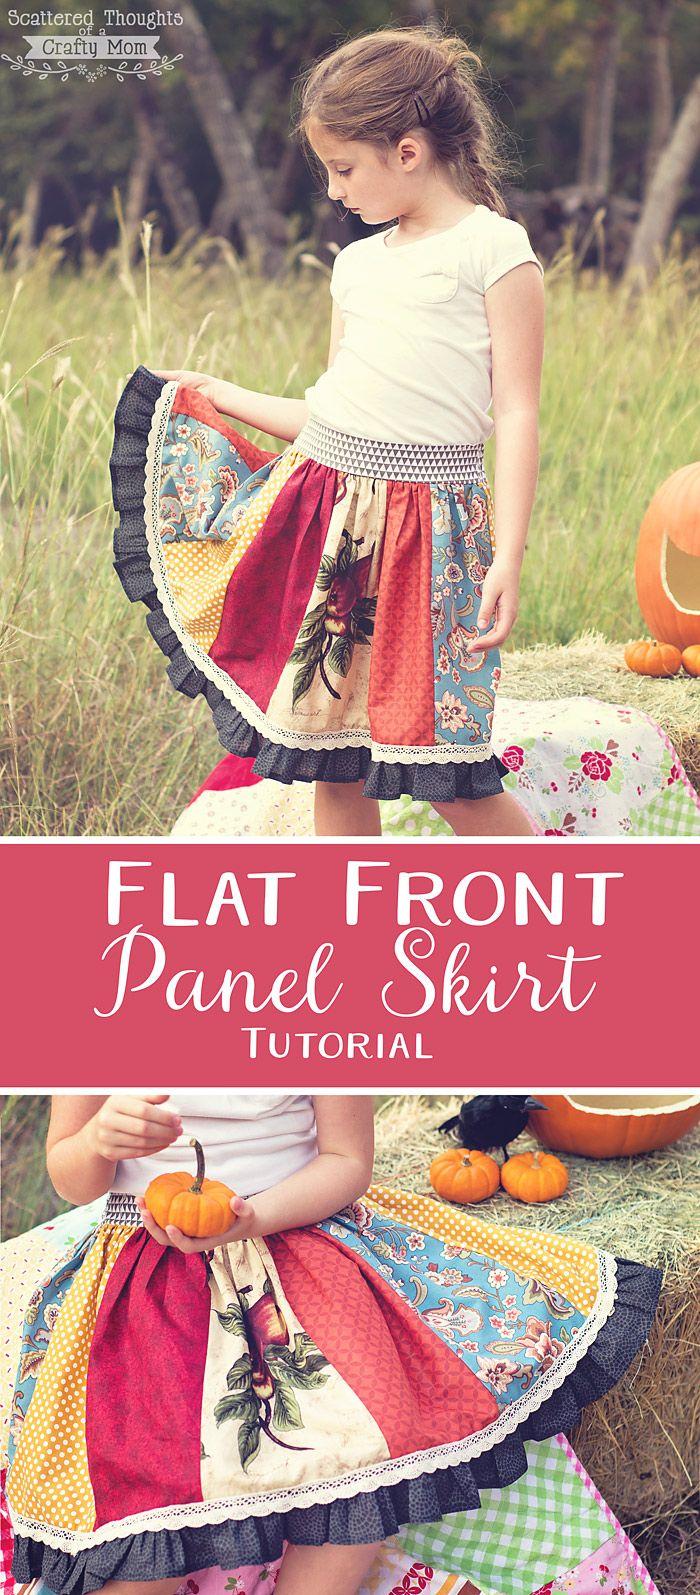 Flat front panel skirt tutorial